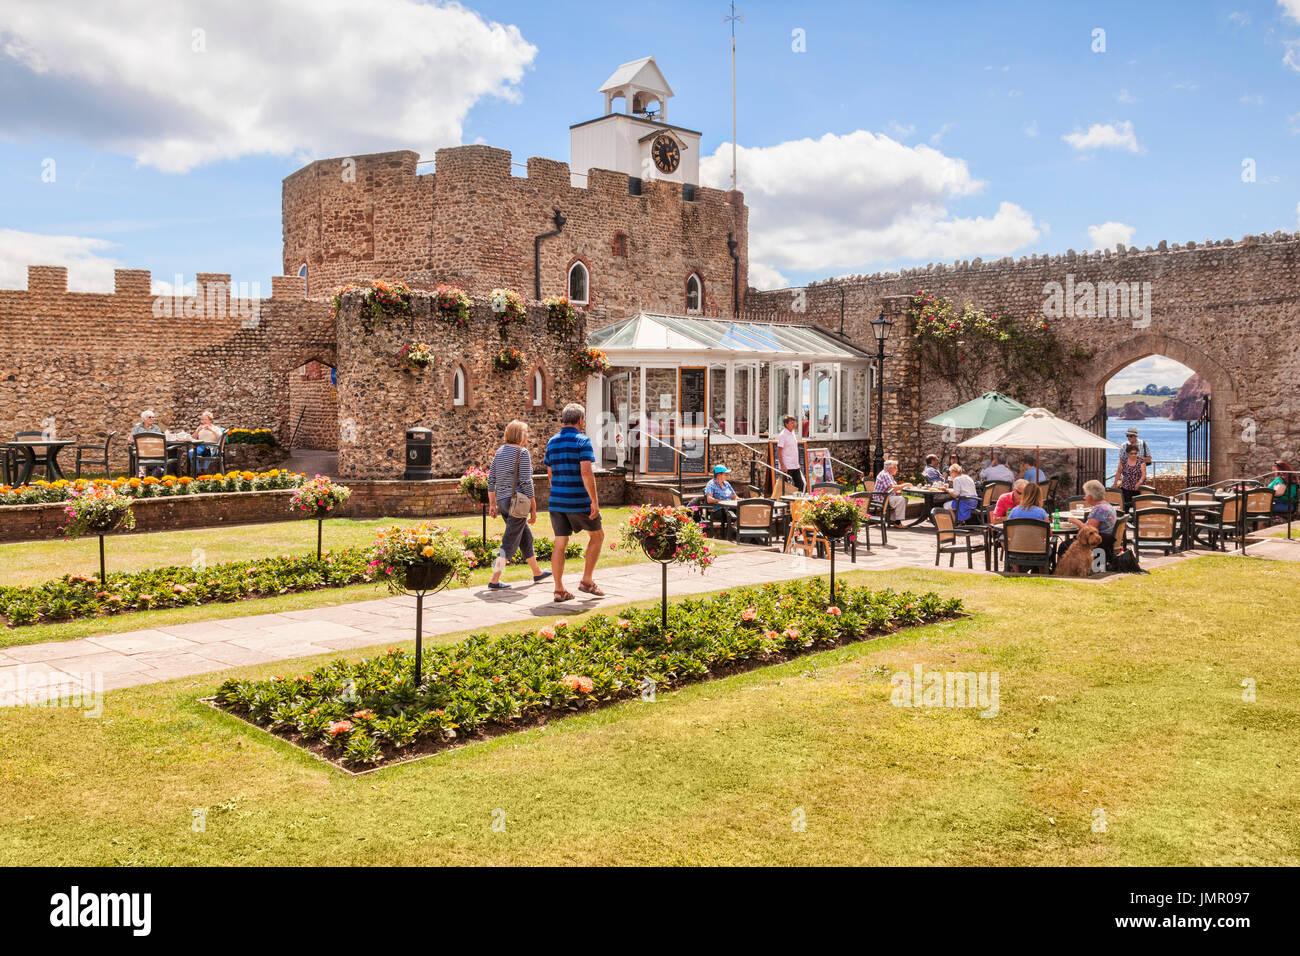 3. Juli 2017: Sidmouth, Dorset, England, UK - Cafe in Connaught Gärten an einem sonnigen Sommertag. Stockbild